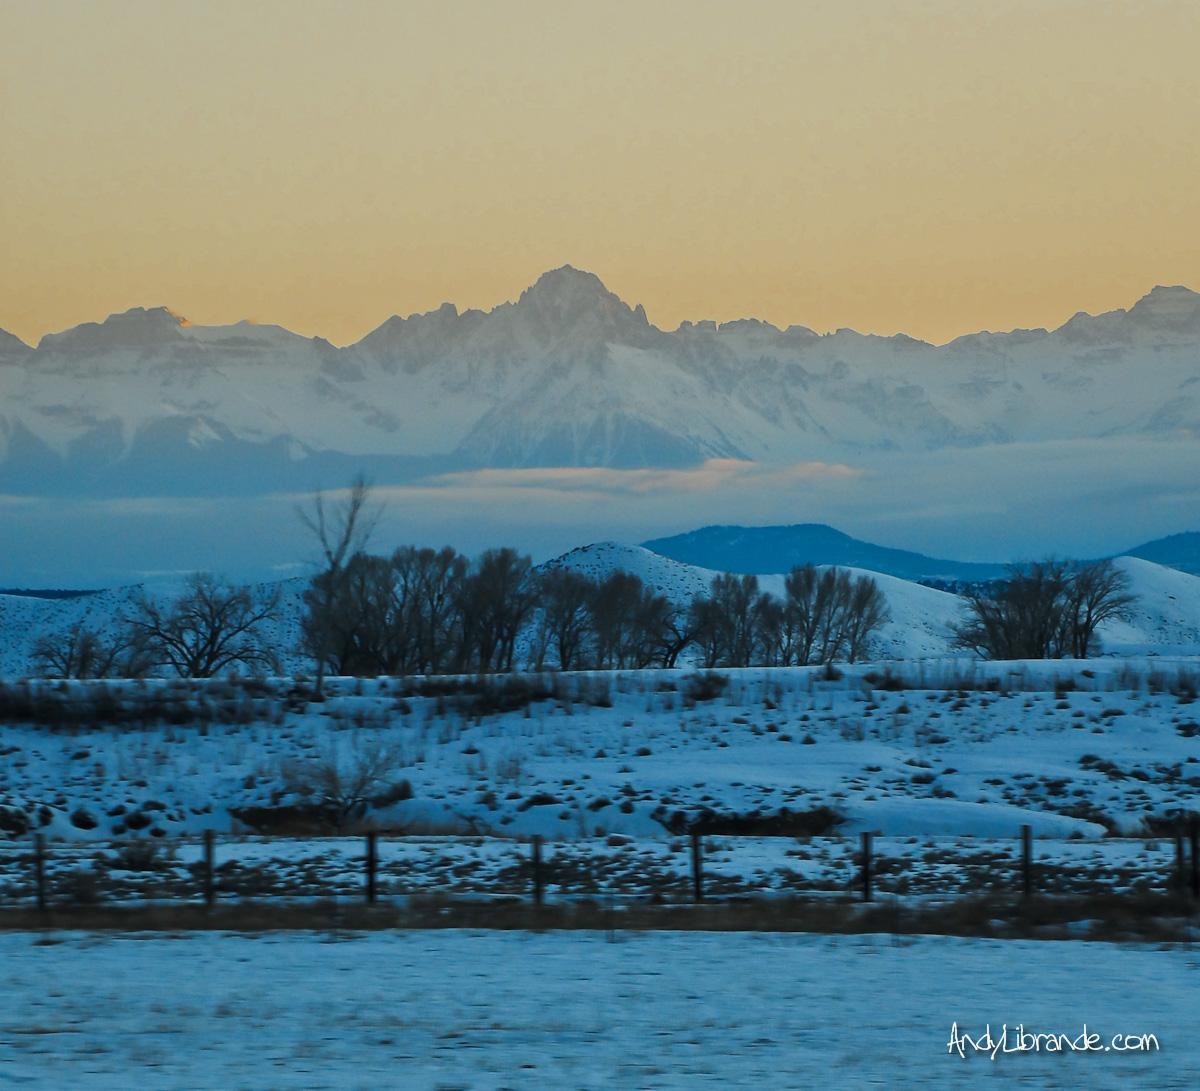 Mt Sherman Colorado at Sunset